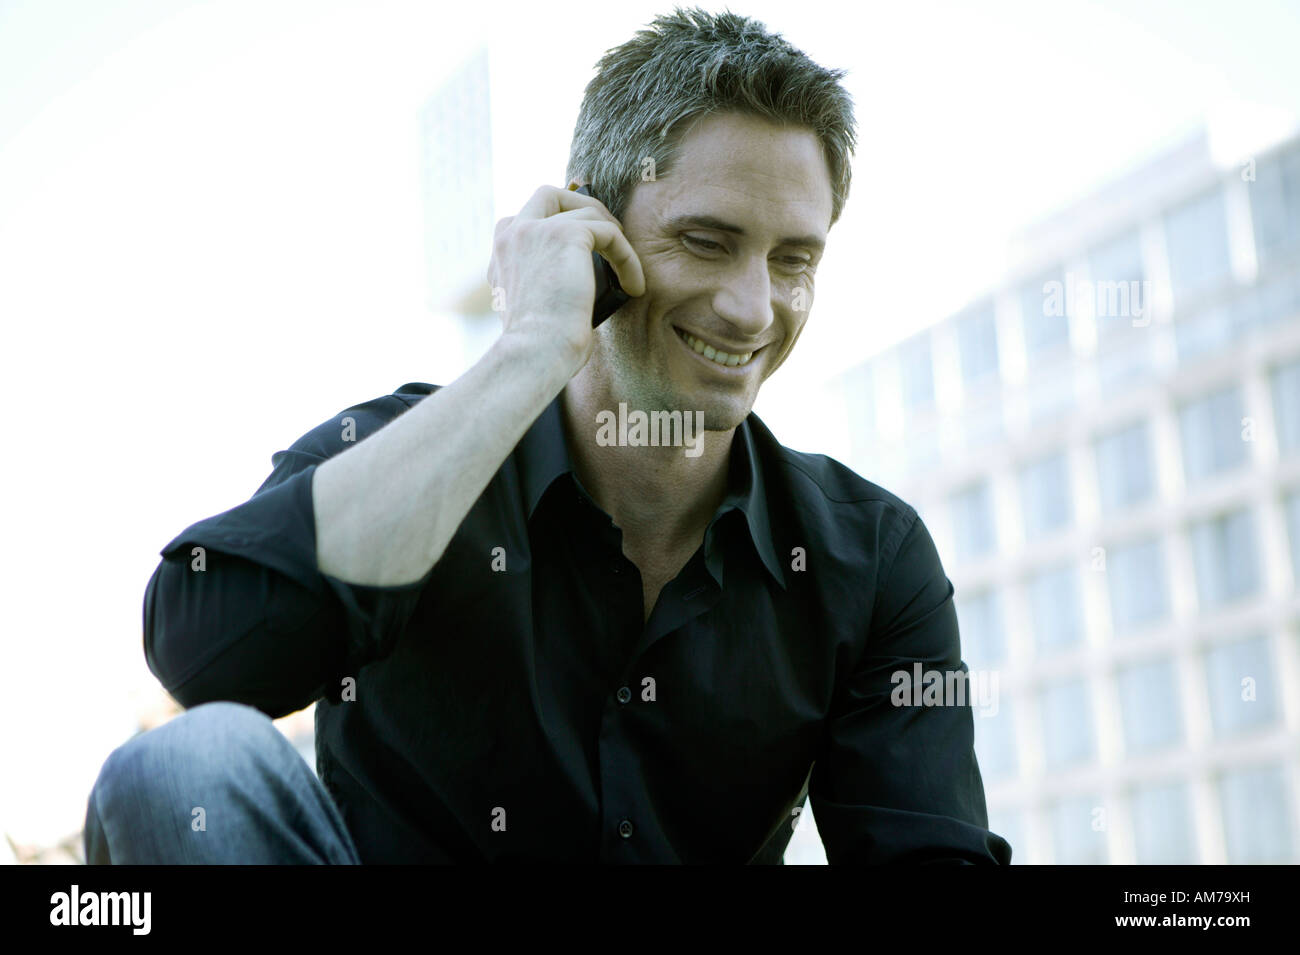 Man in black shirt talking on his mobile - Stock Image